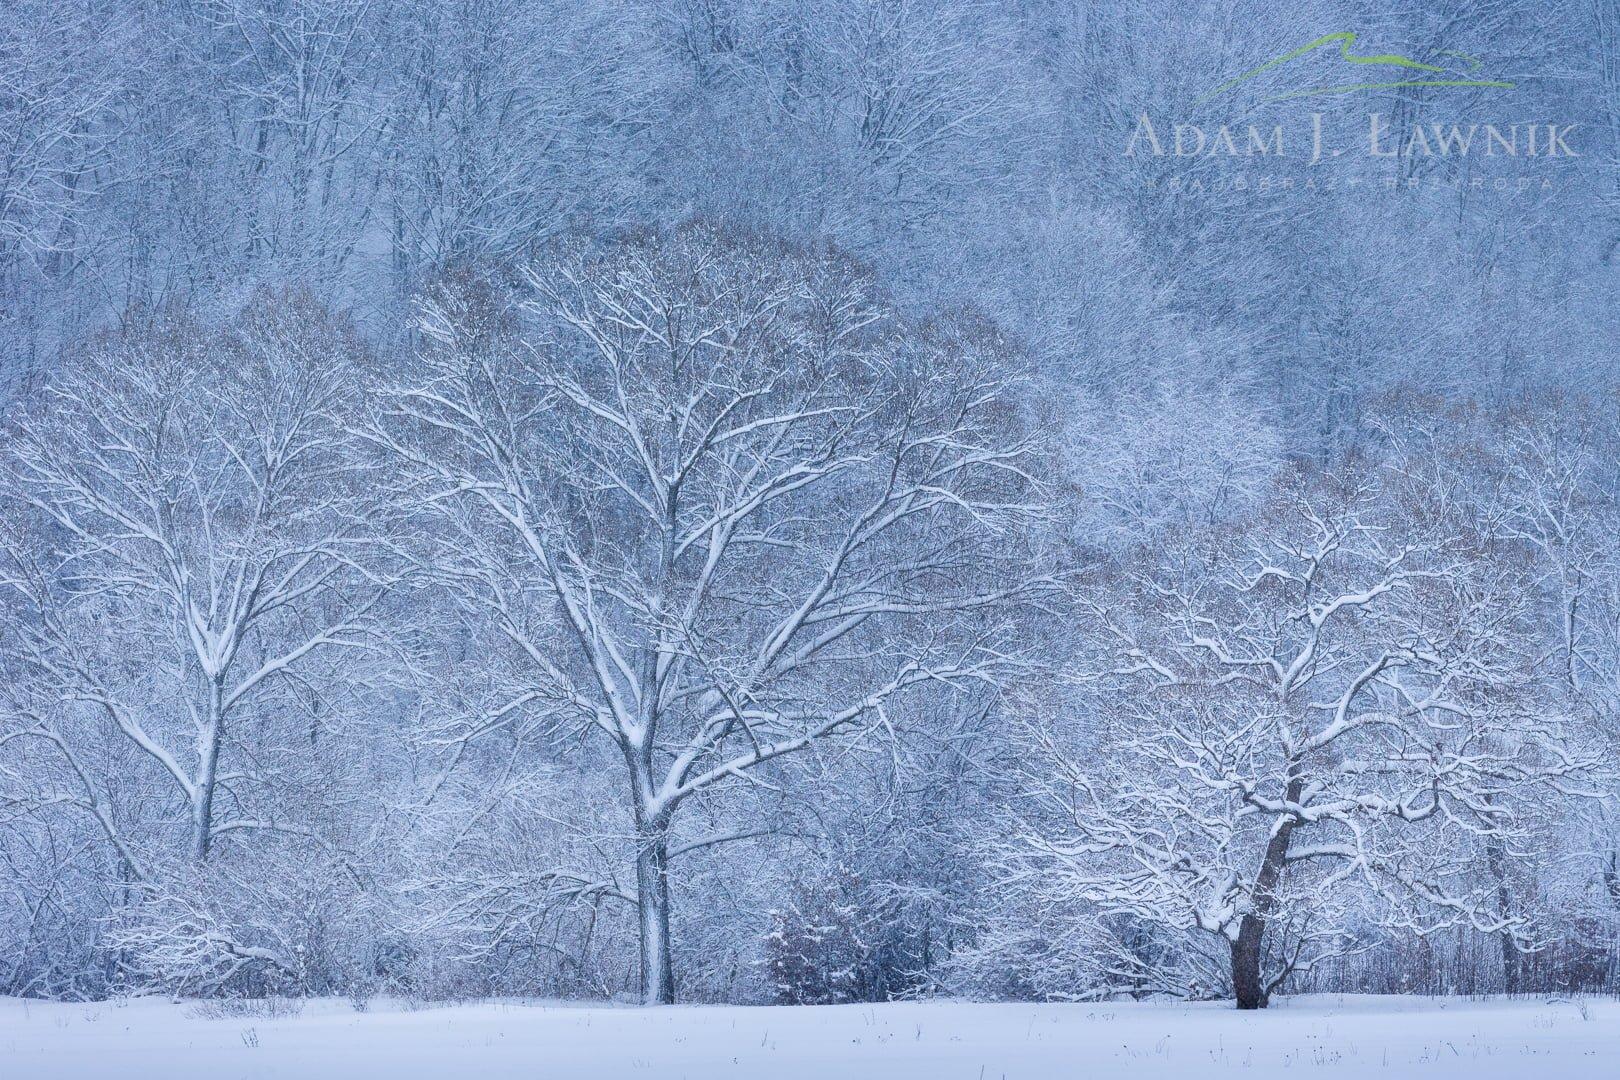 Magura National Park, Poland 1701-00076C